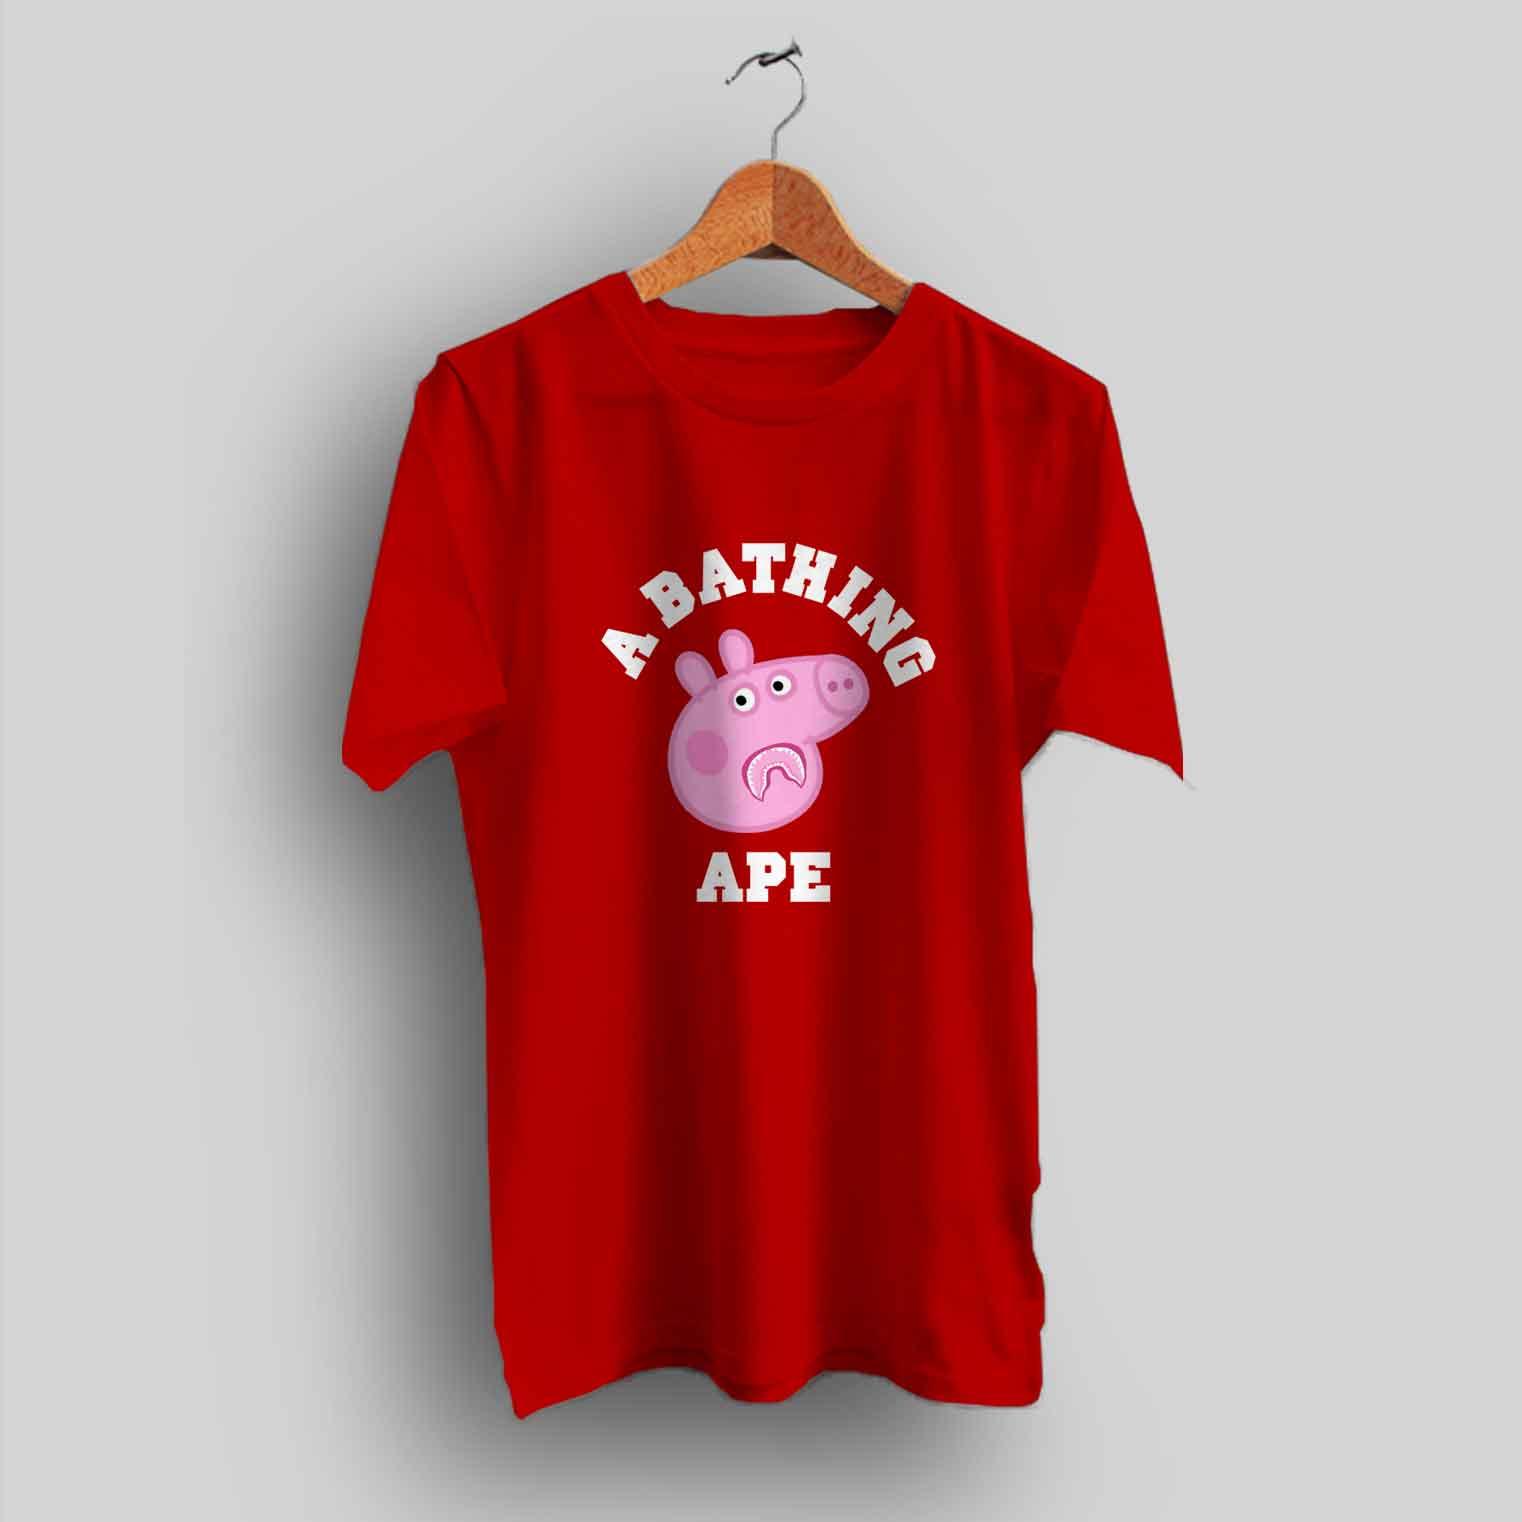 42cae59aa97e Funny Peppa Pig X Bape Shark T Shirt Collaboration - HotVero.com